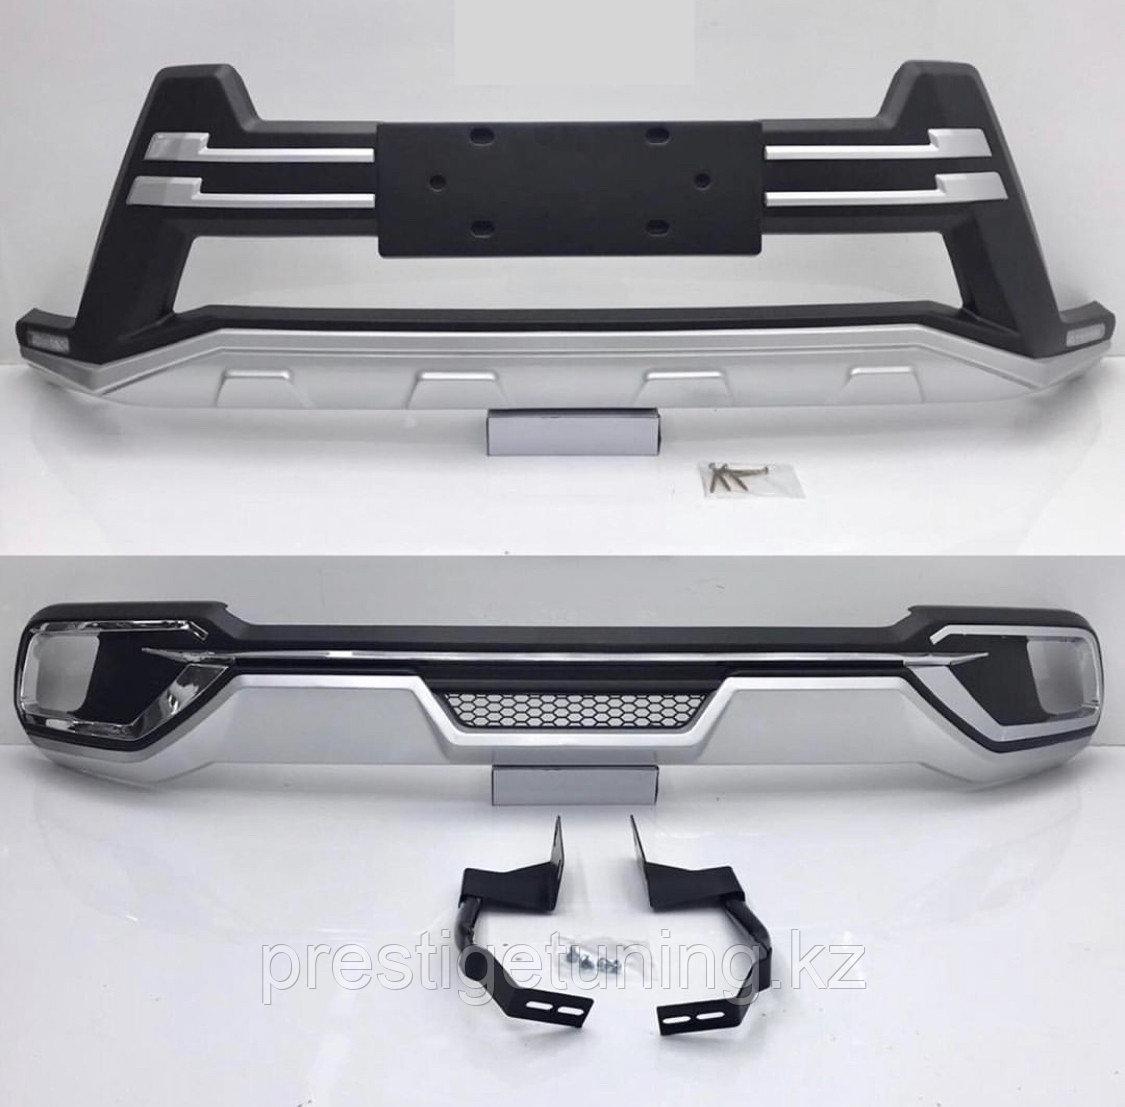 Накладки на бампера на Toyota Highlander 2018-20